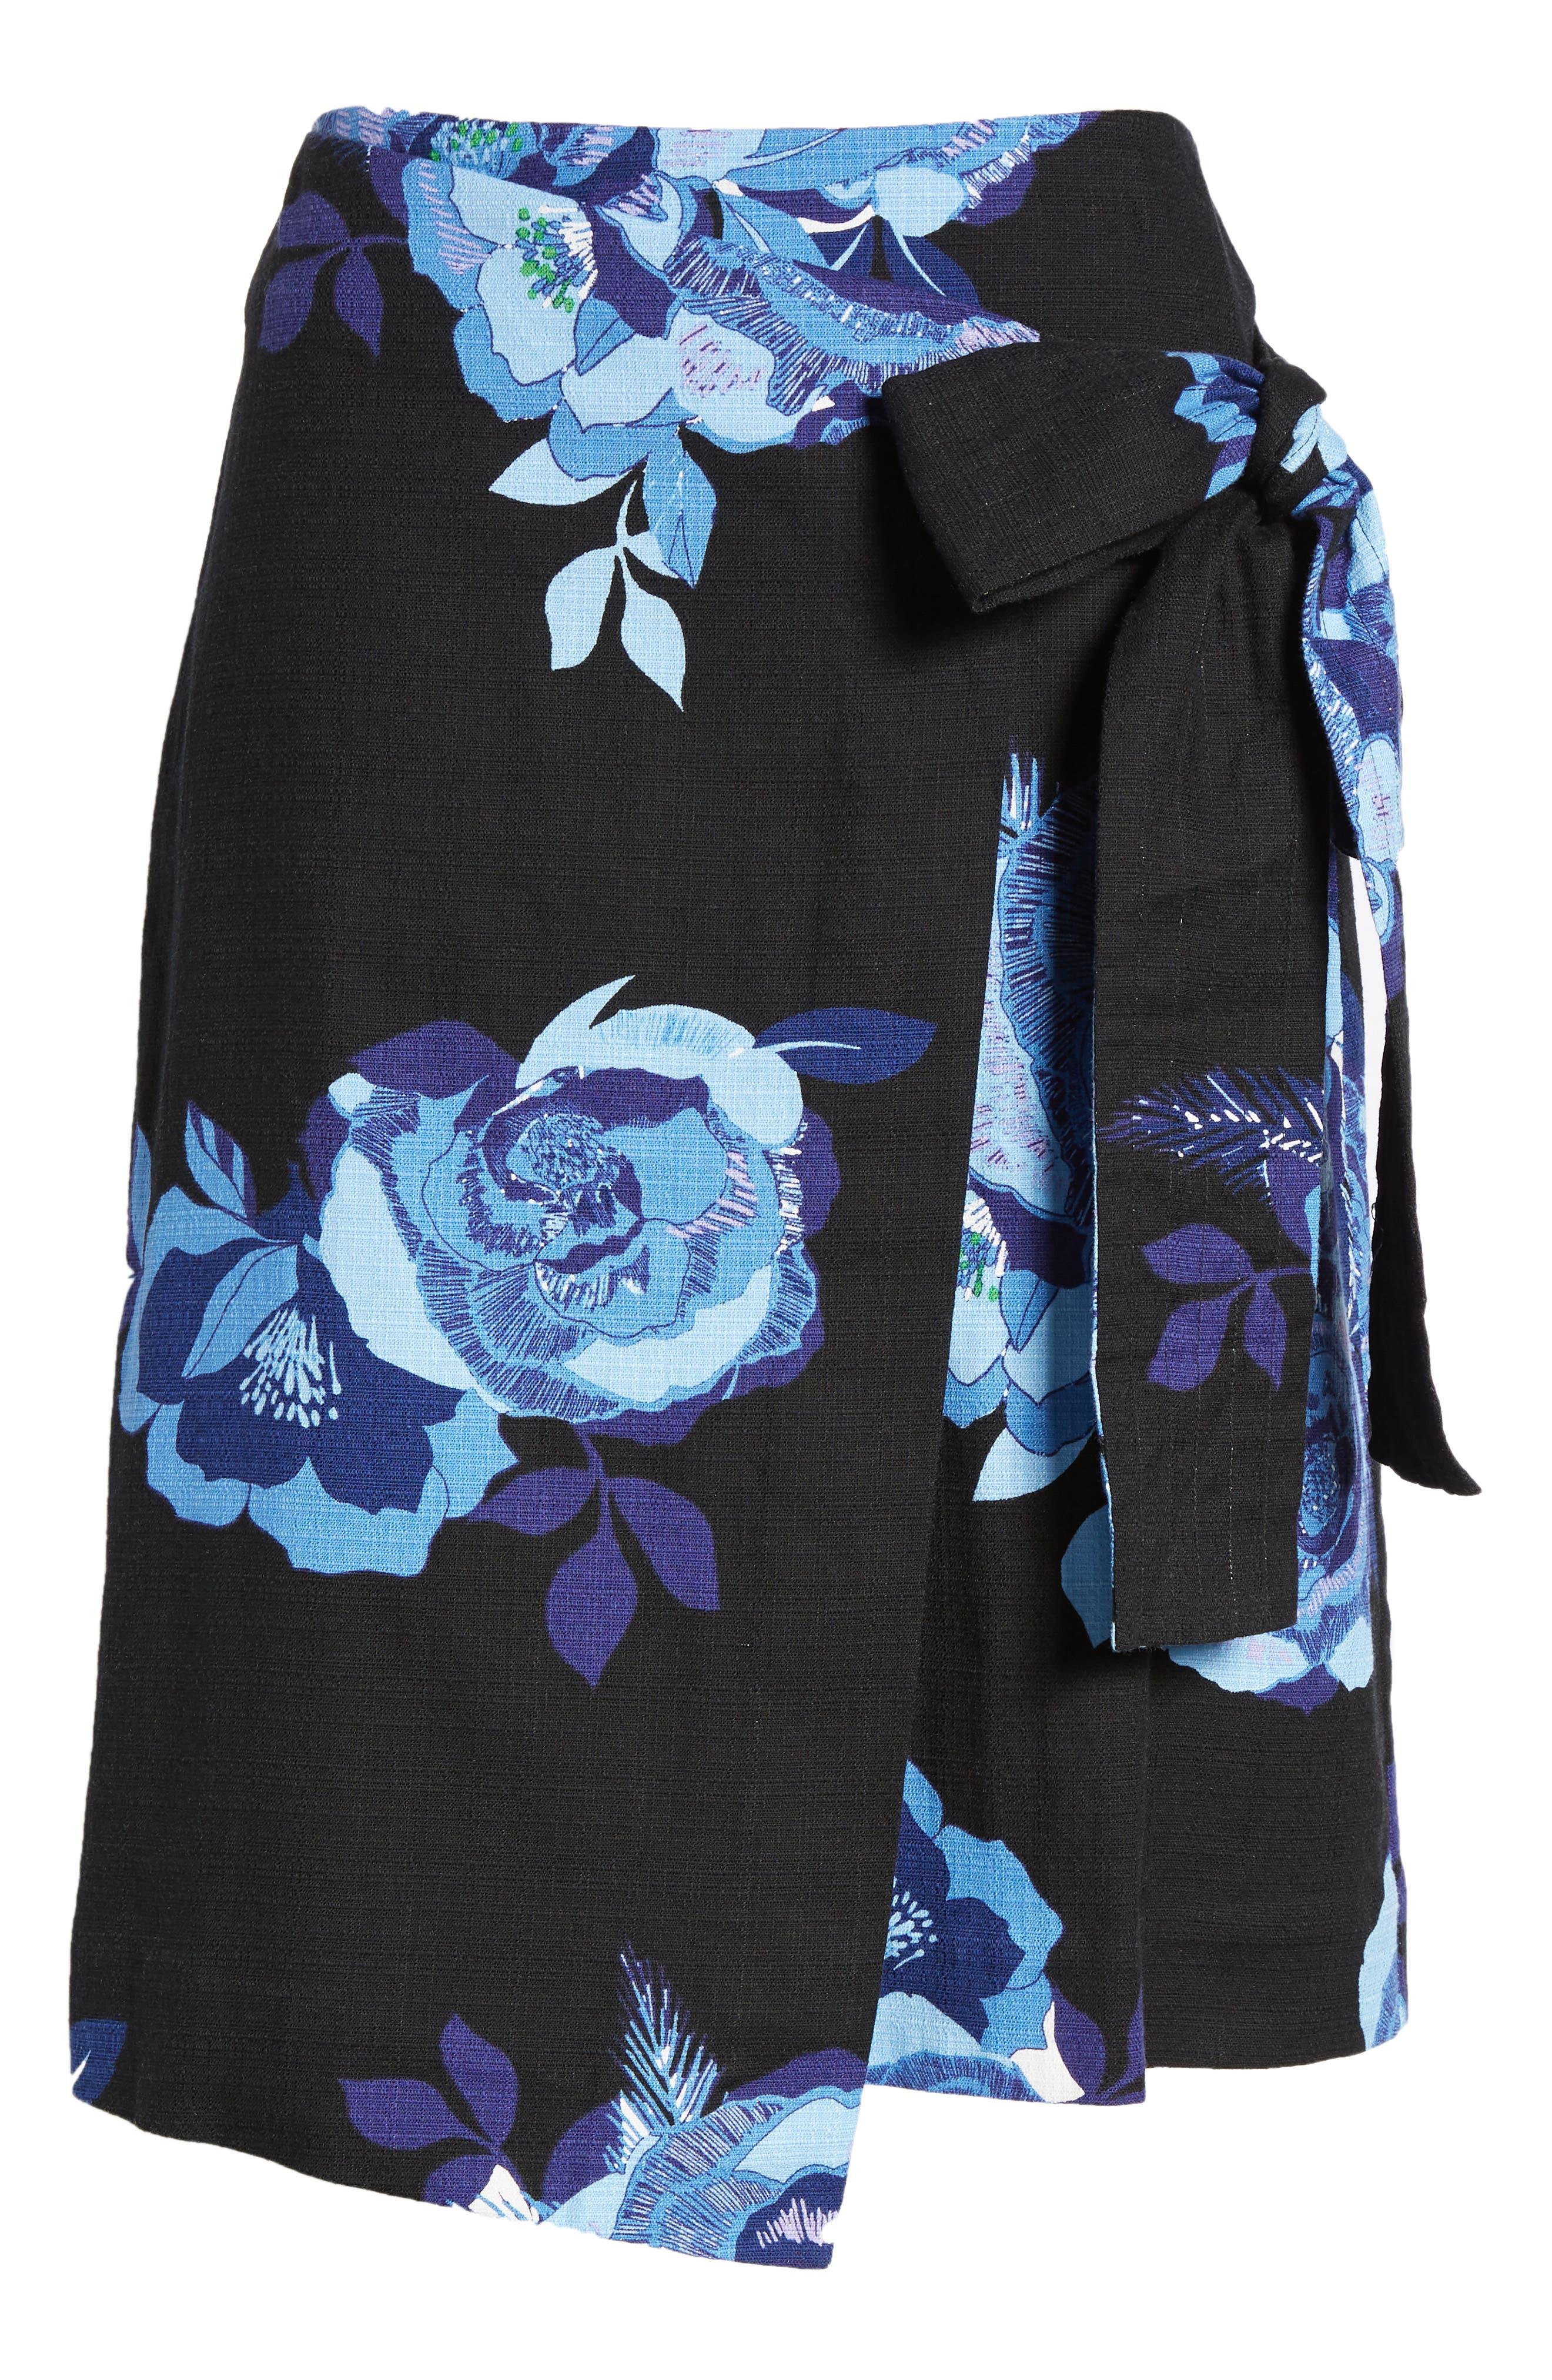 Floral Cotton Blend Wrap Skirt,                             Alternate thumbnail 6, color,                             Black- Blue Rose Print